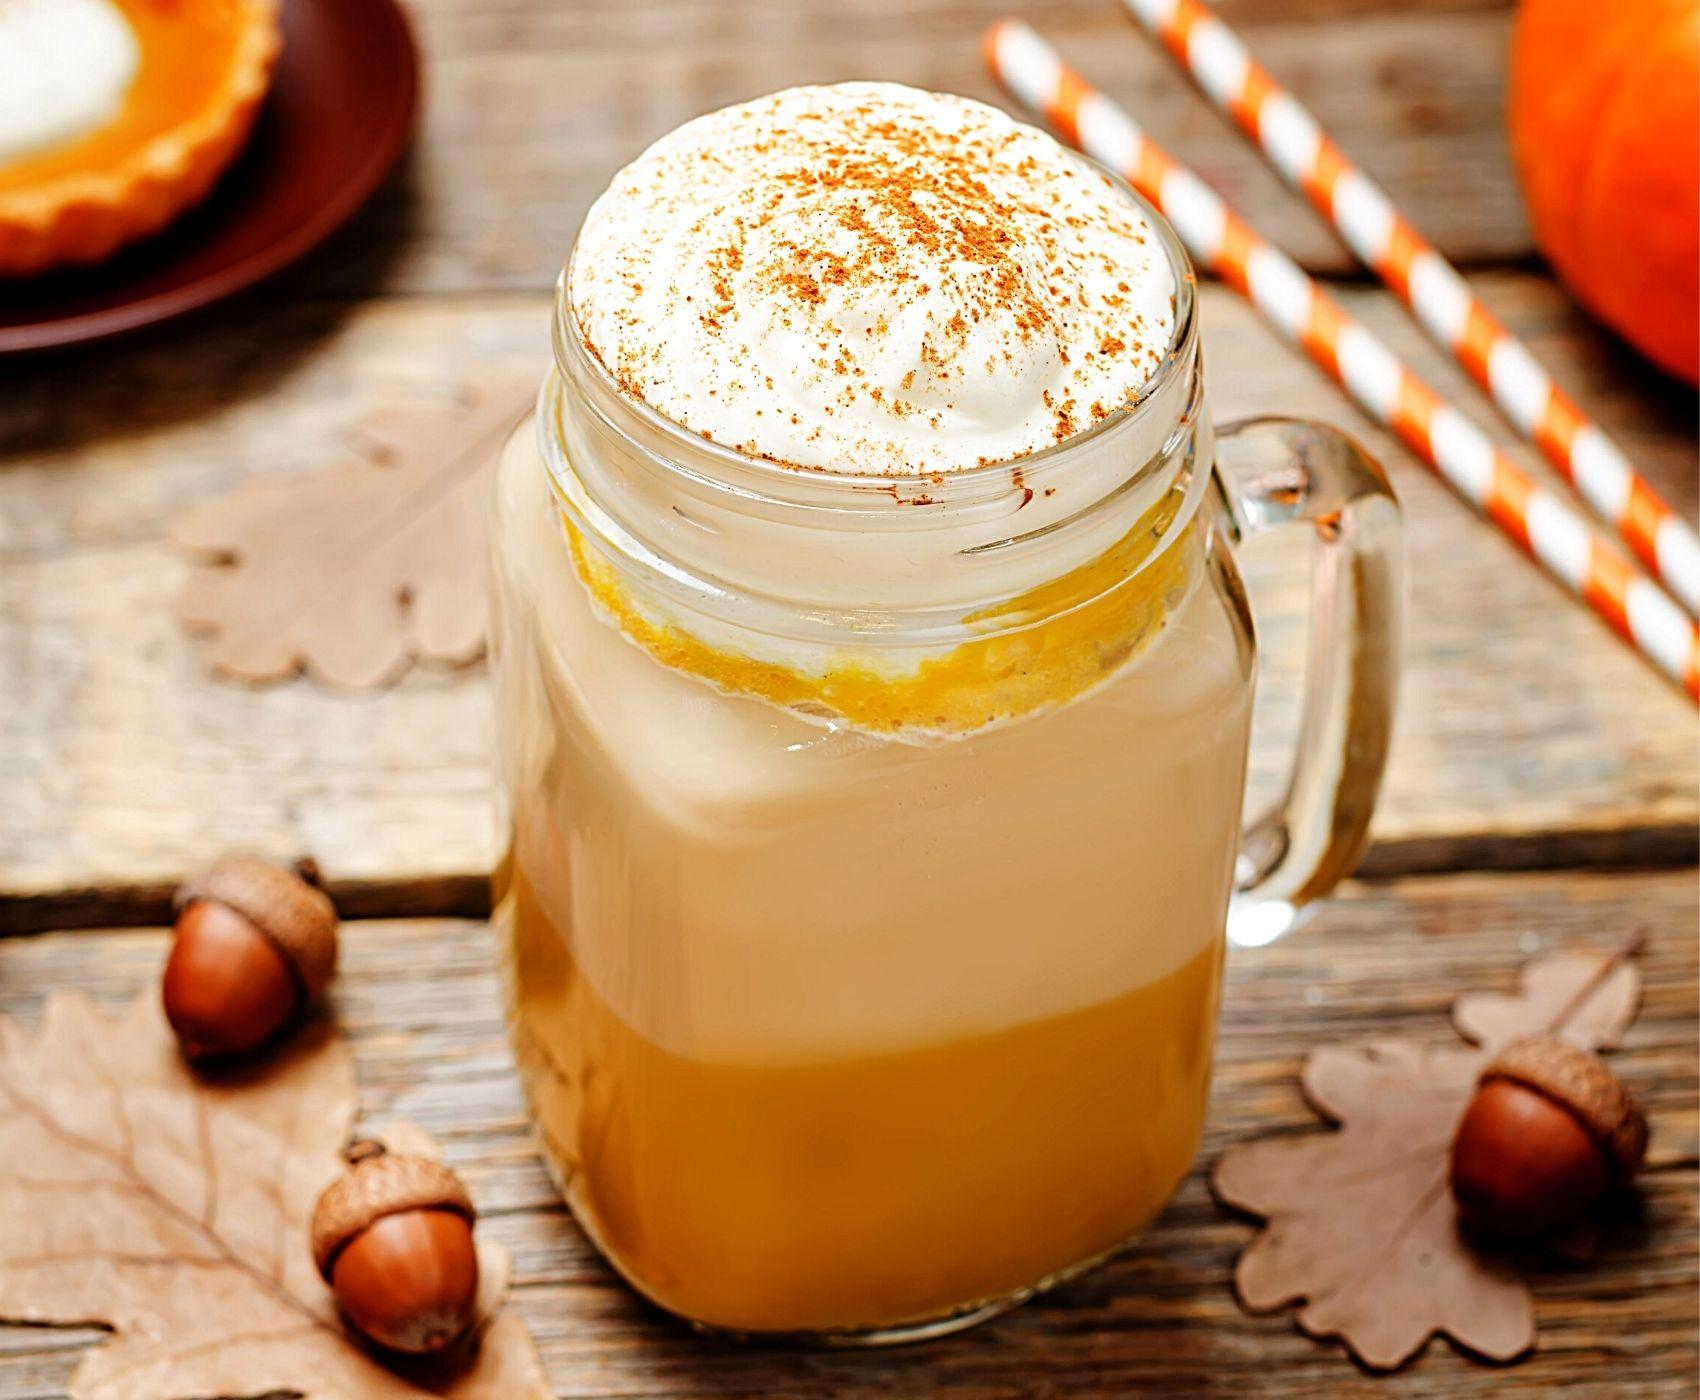 The Best Pumpkin Spice Drink Recipes